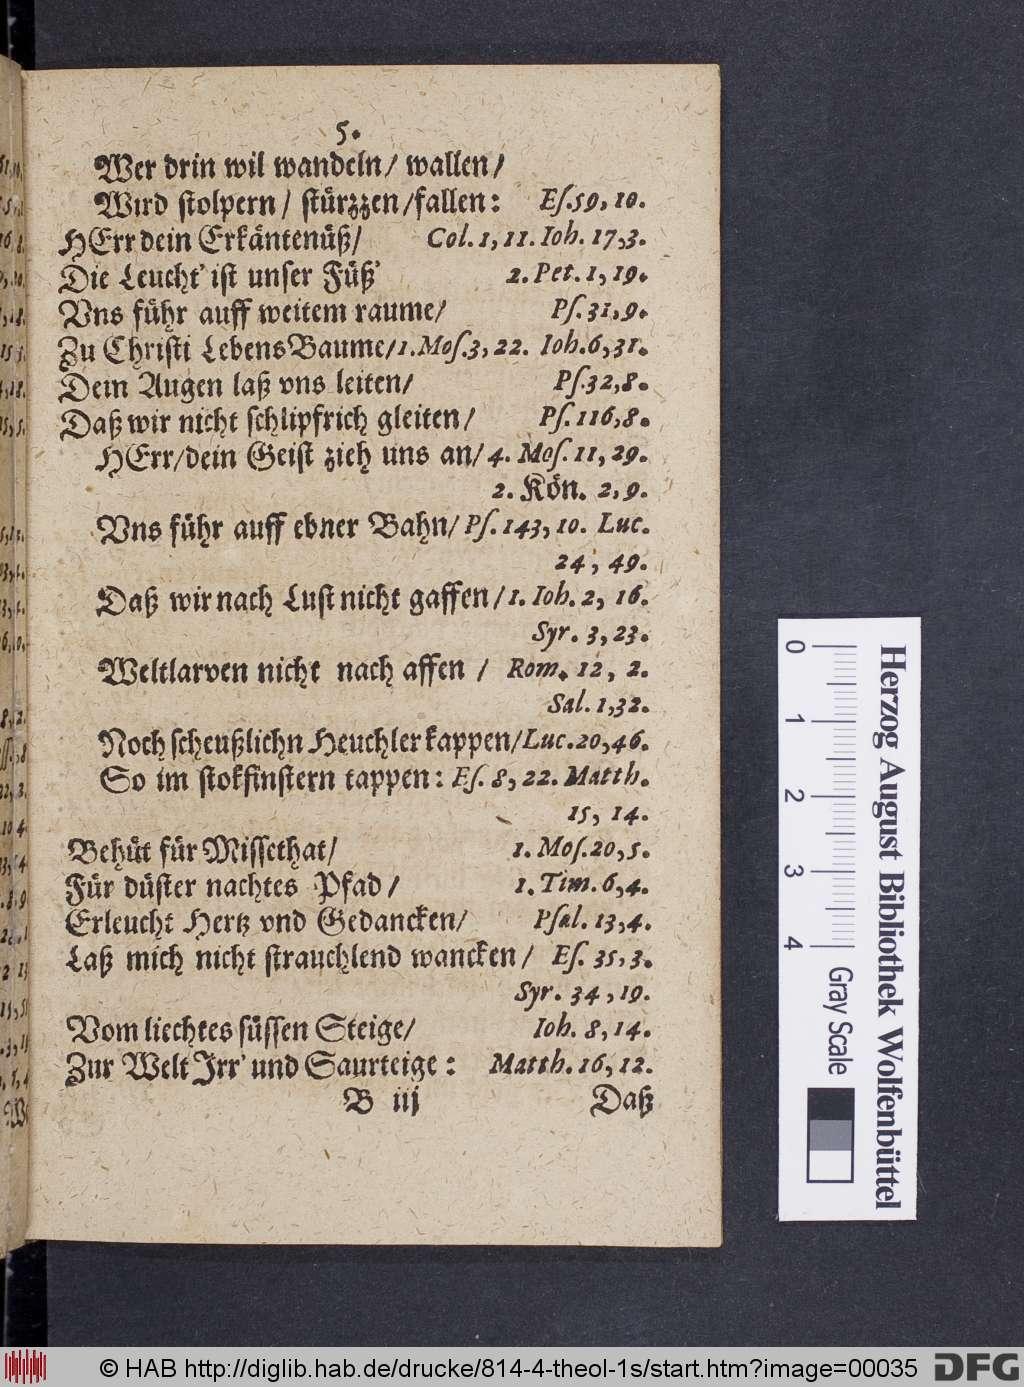 http://diglib.hab.de/drucke/814-4-theol-1s/00035.jpg